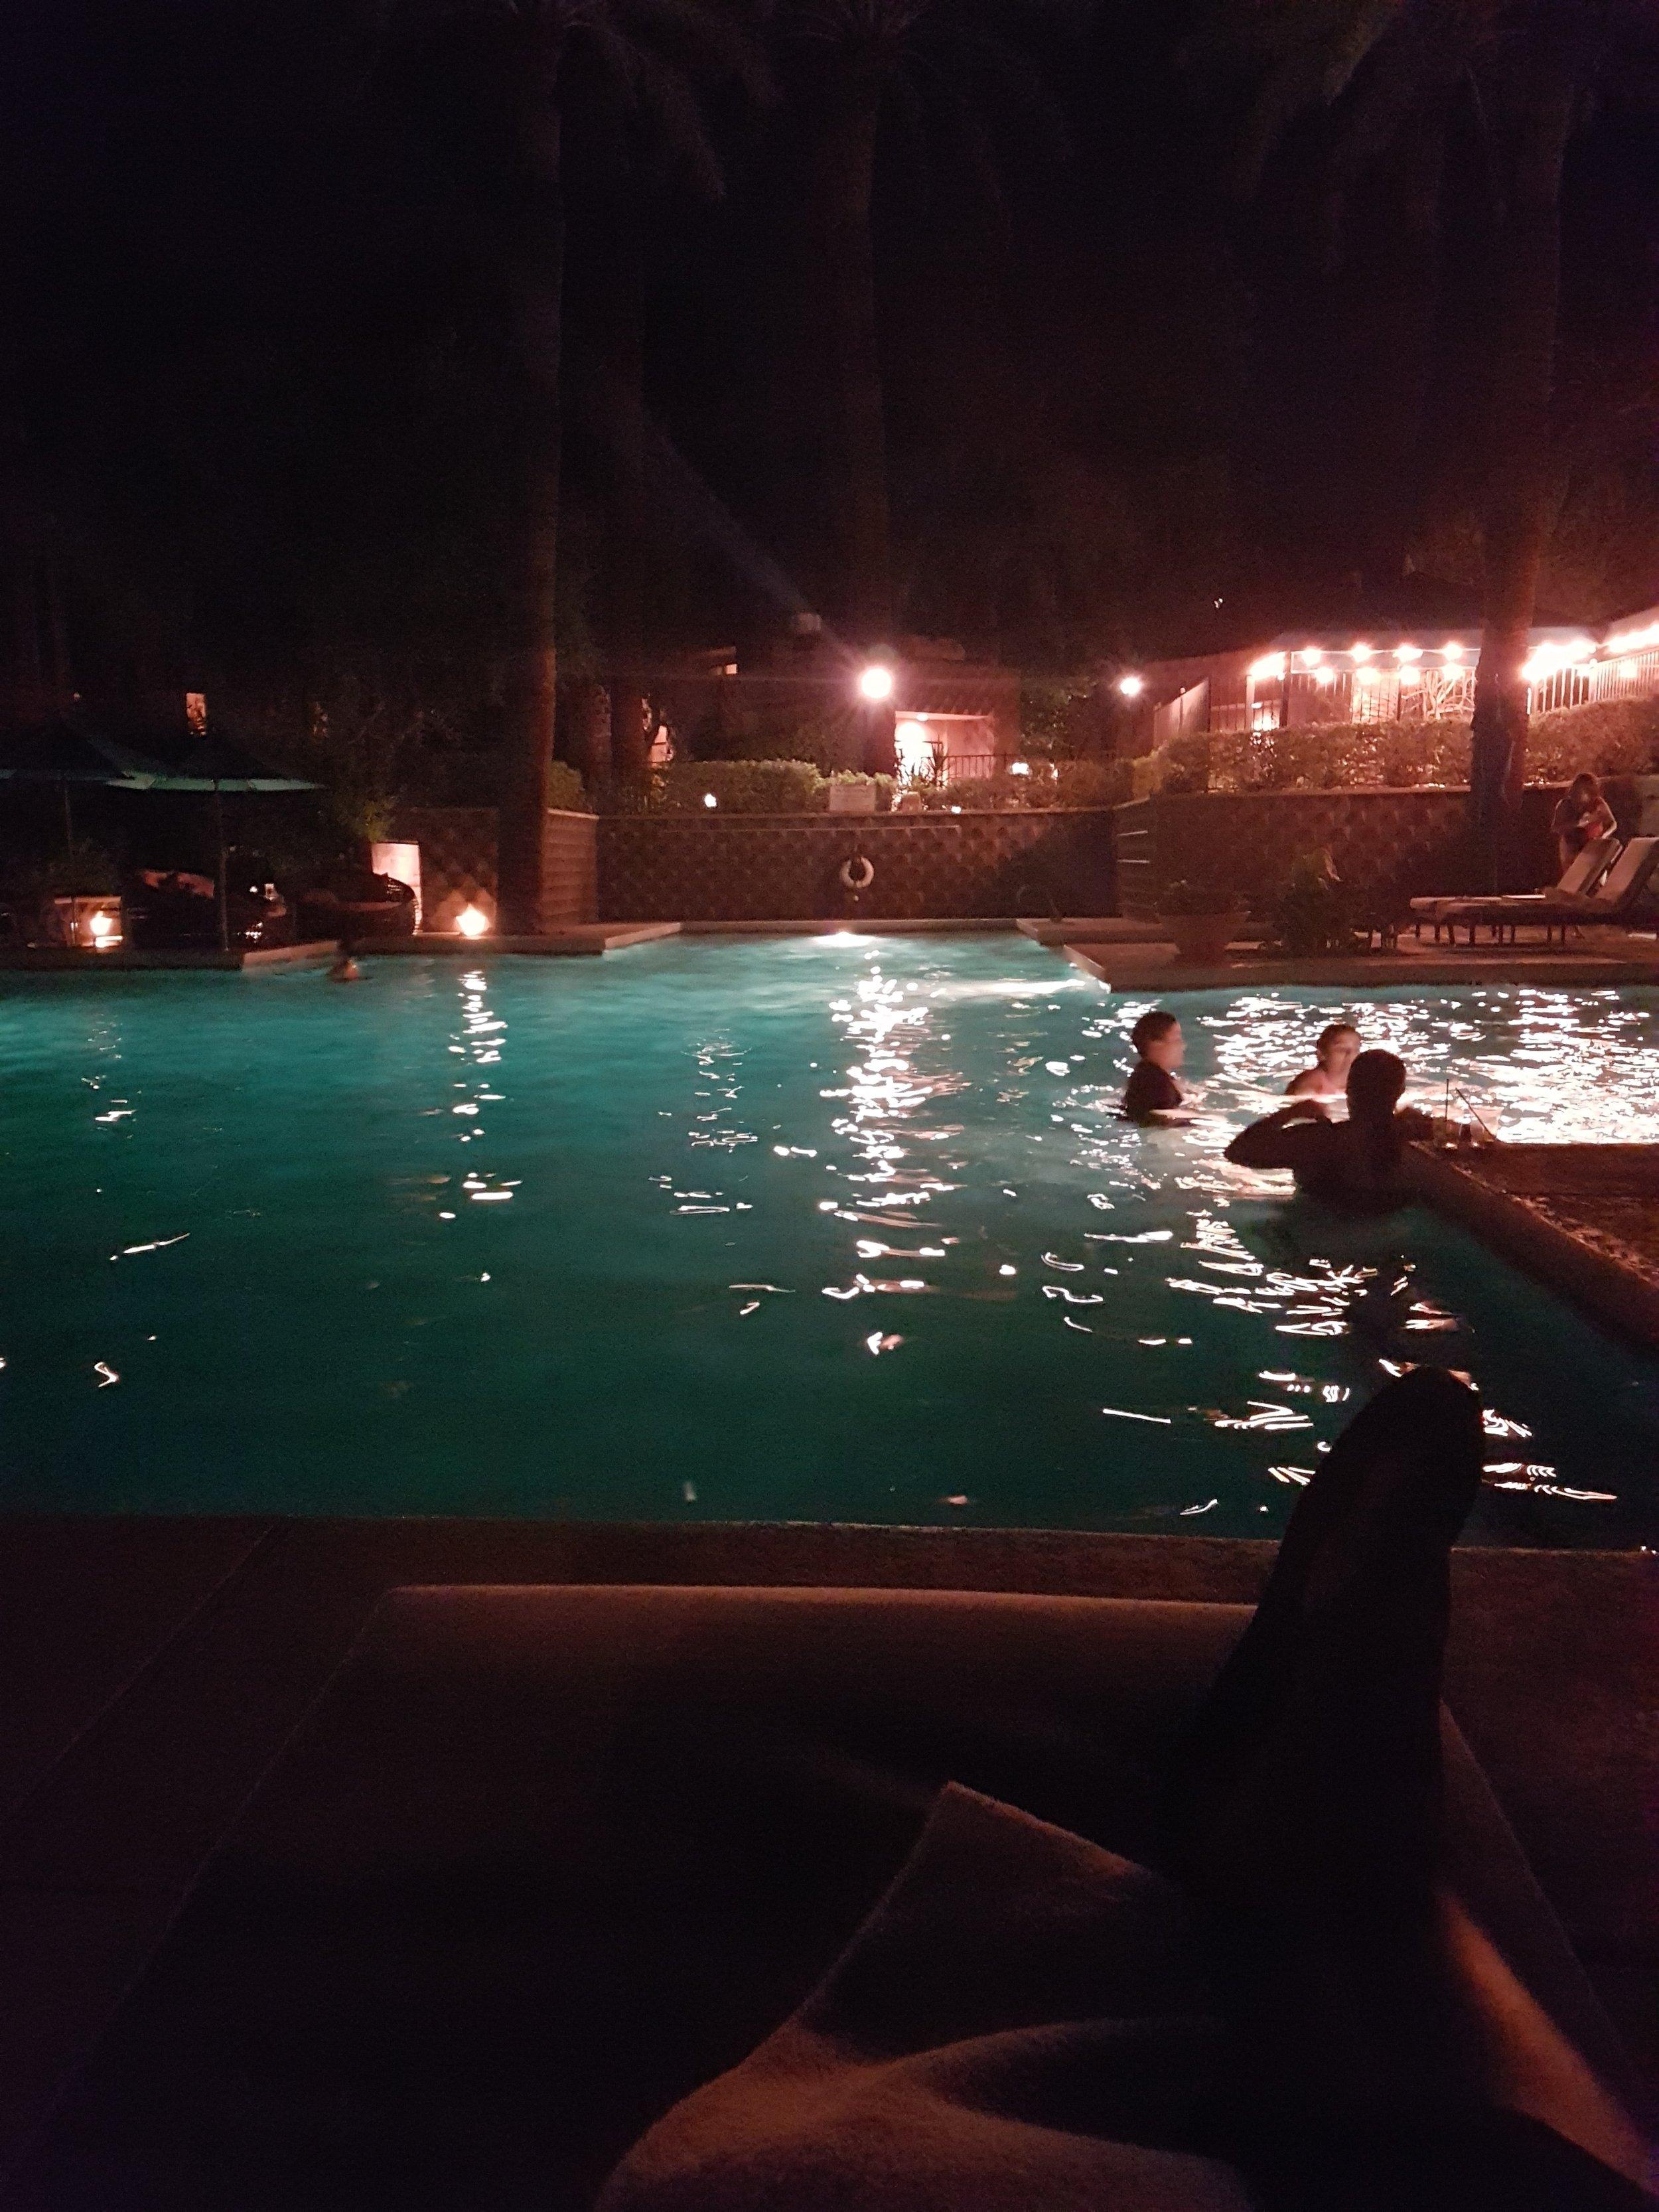 A leisure night swim